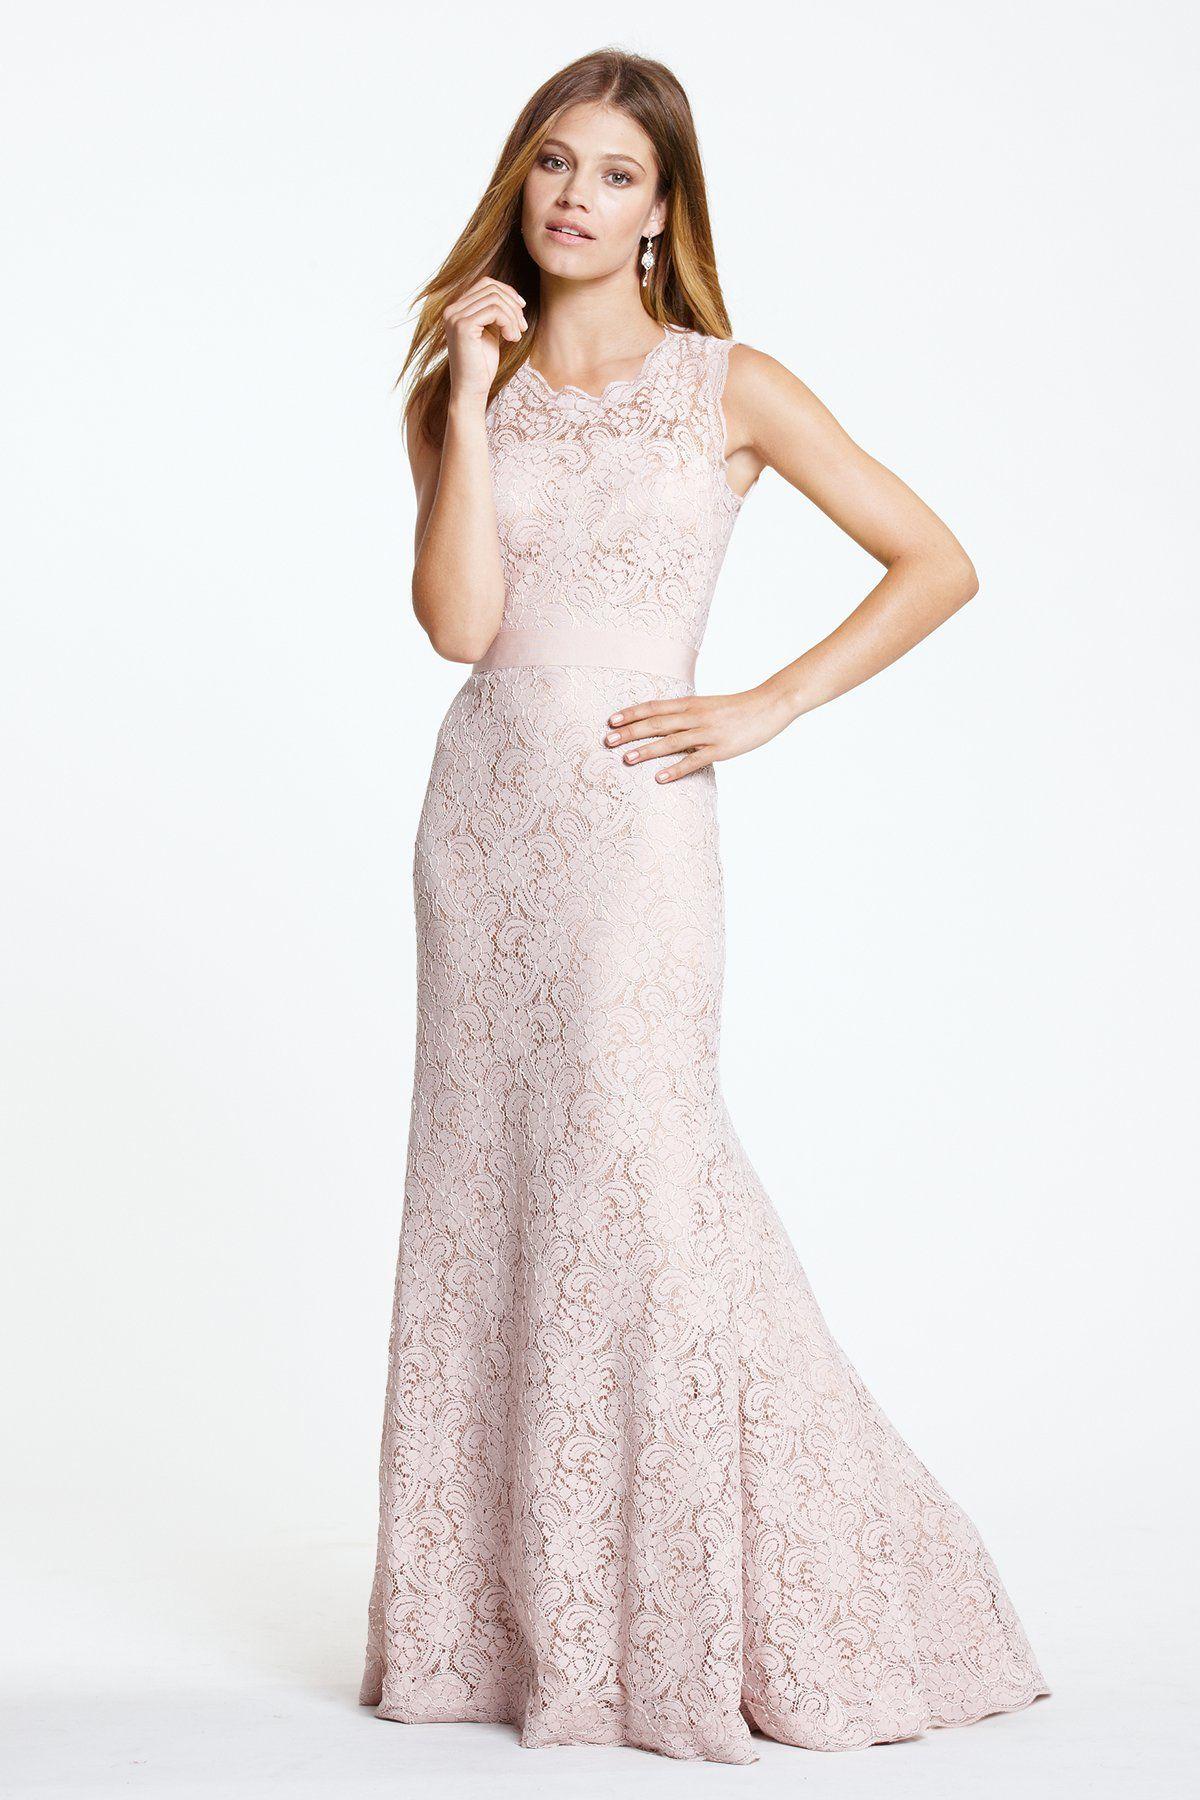 Bride\'s maids dresses ... David\'s Bridal and Donna\'s bridal shop in ...